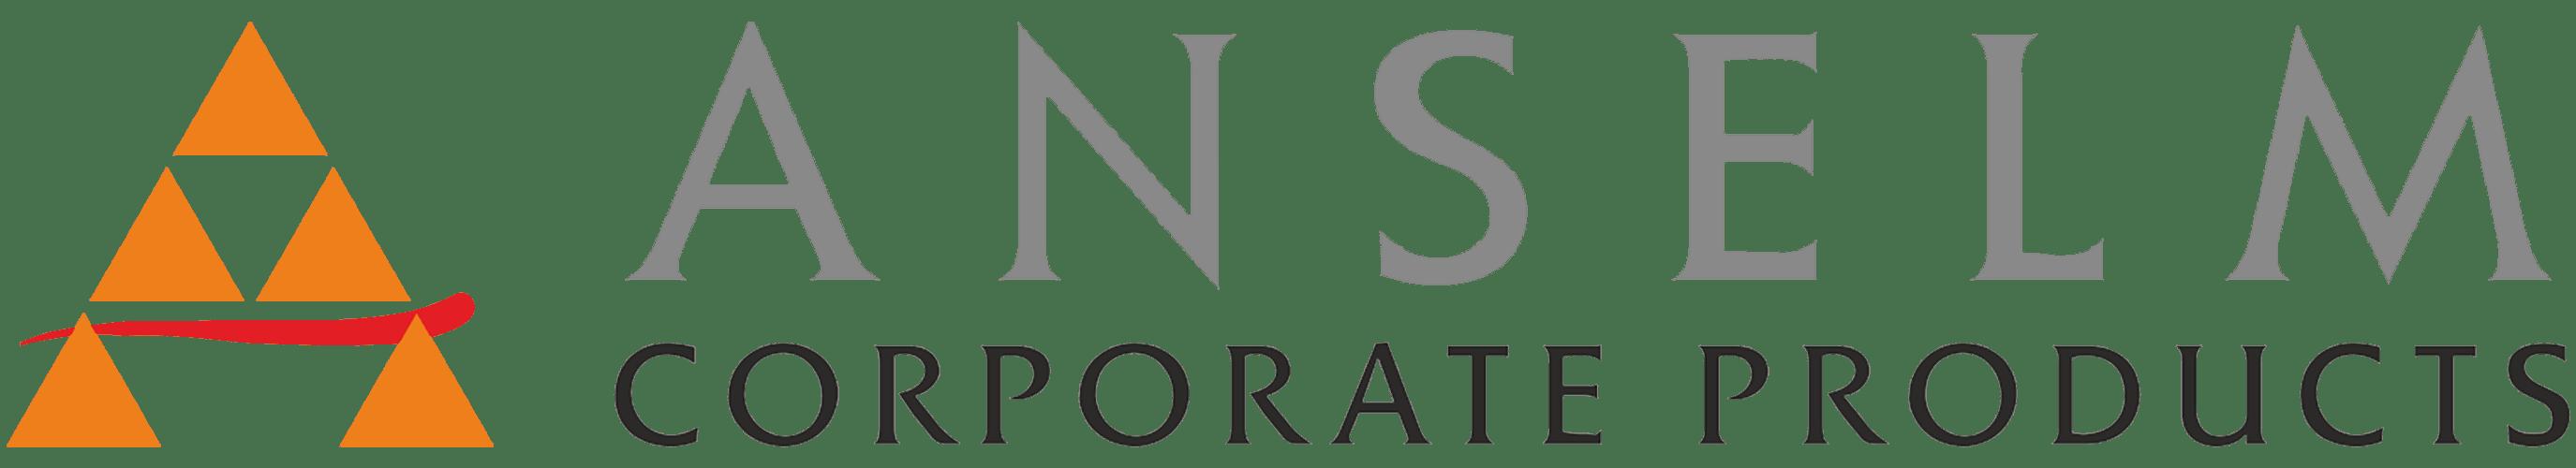 anselm-corporate-fashion_logo-head